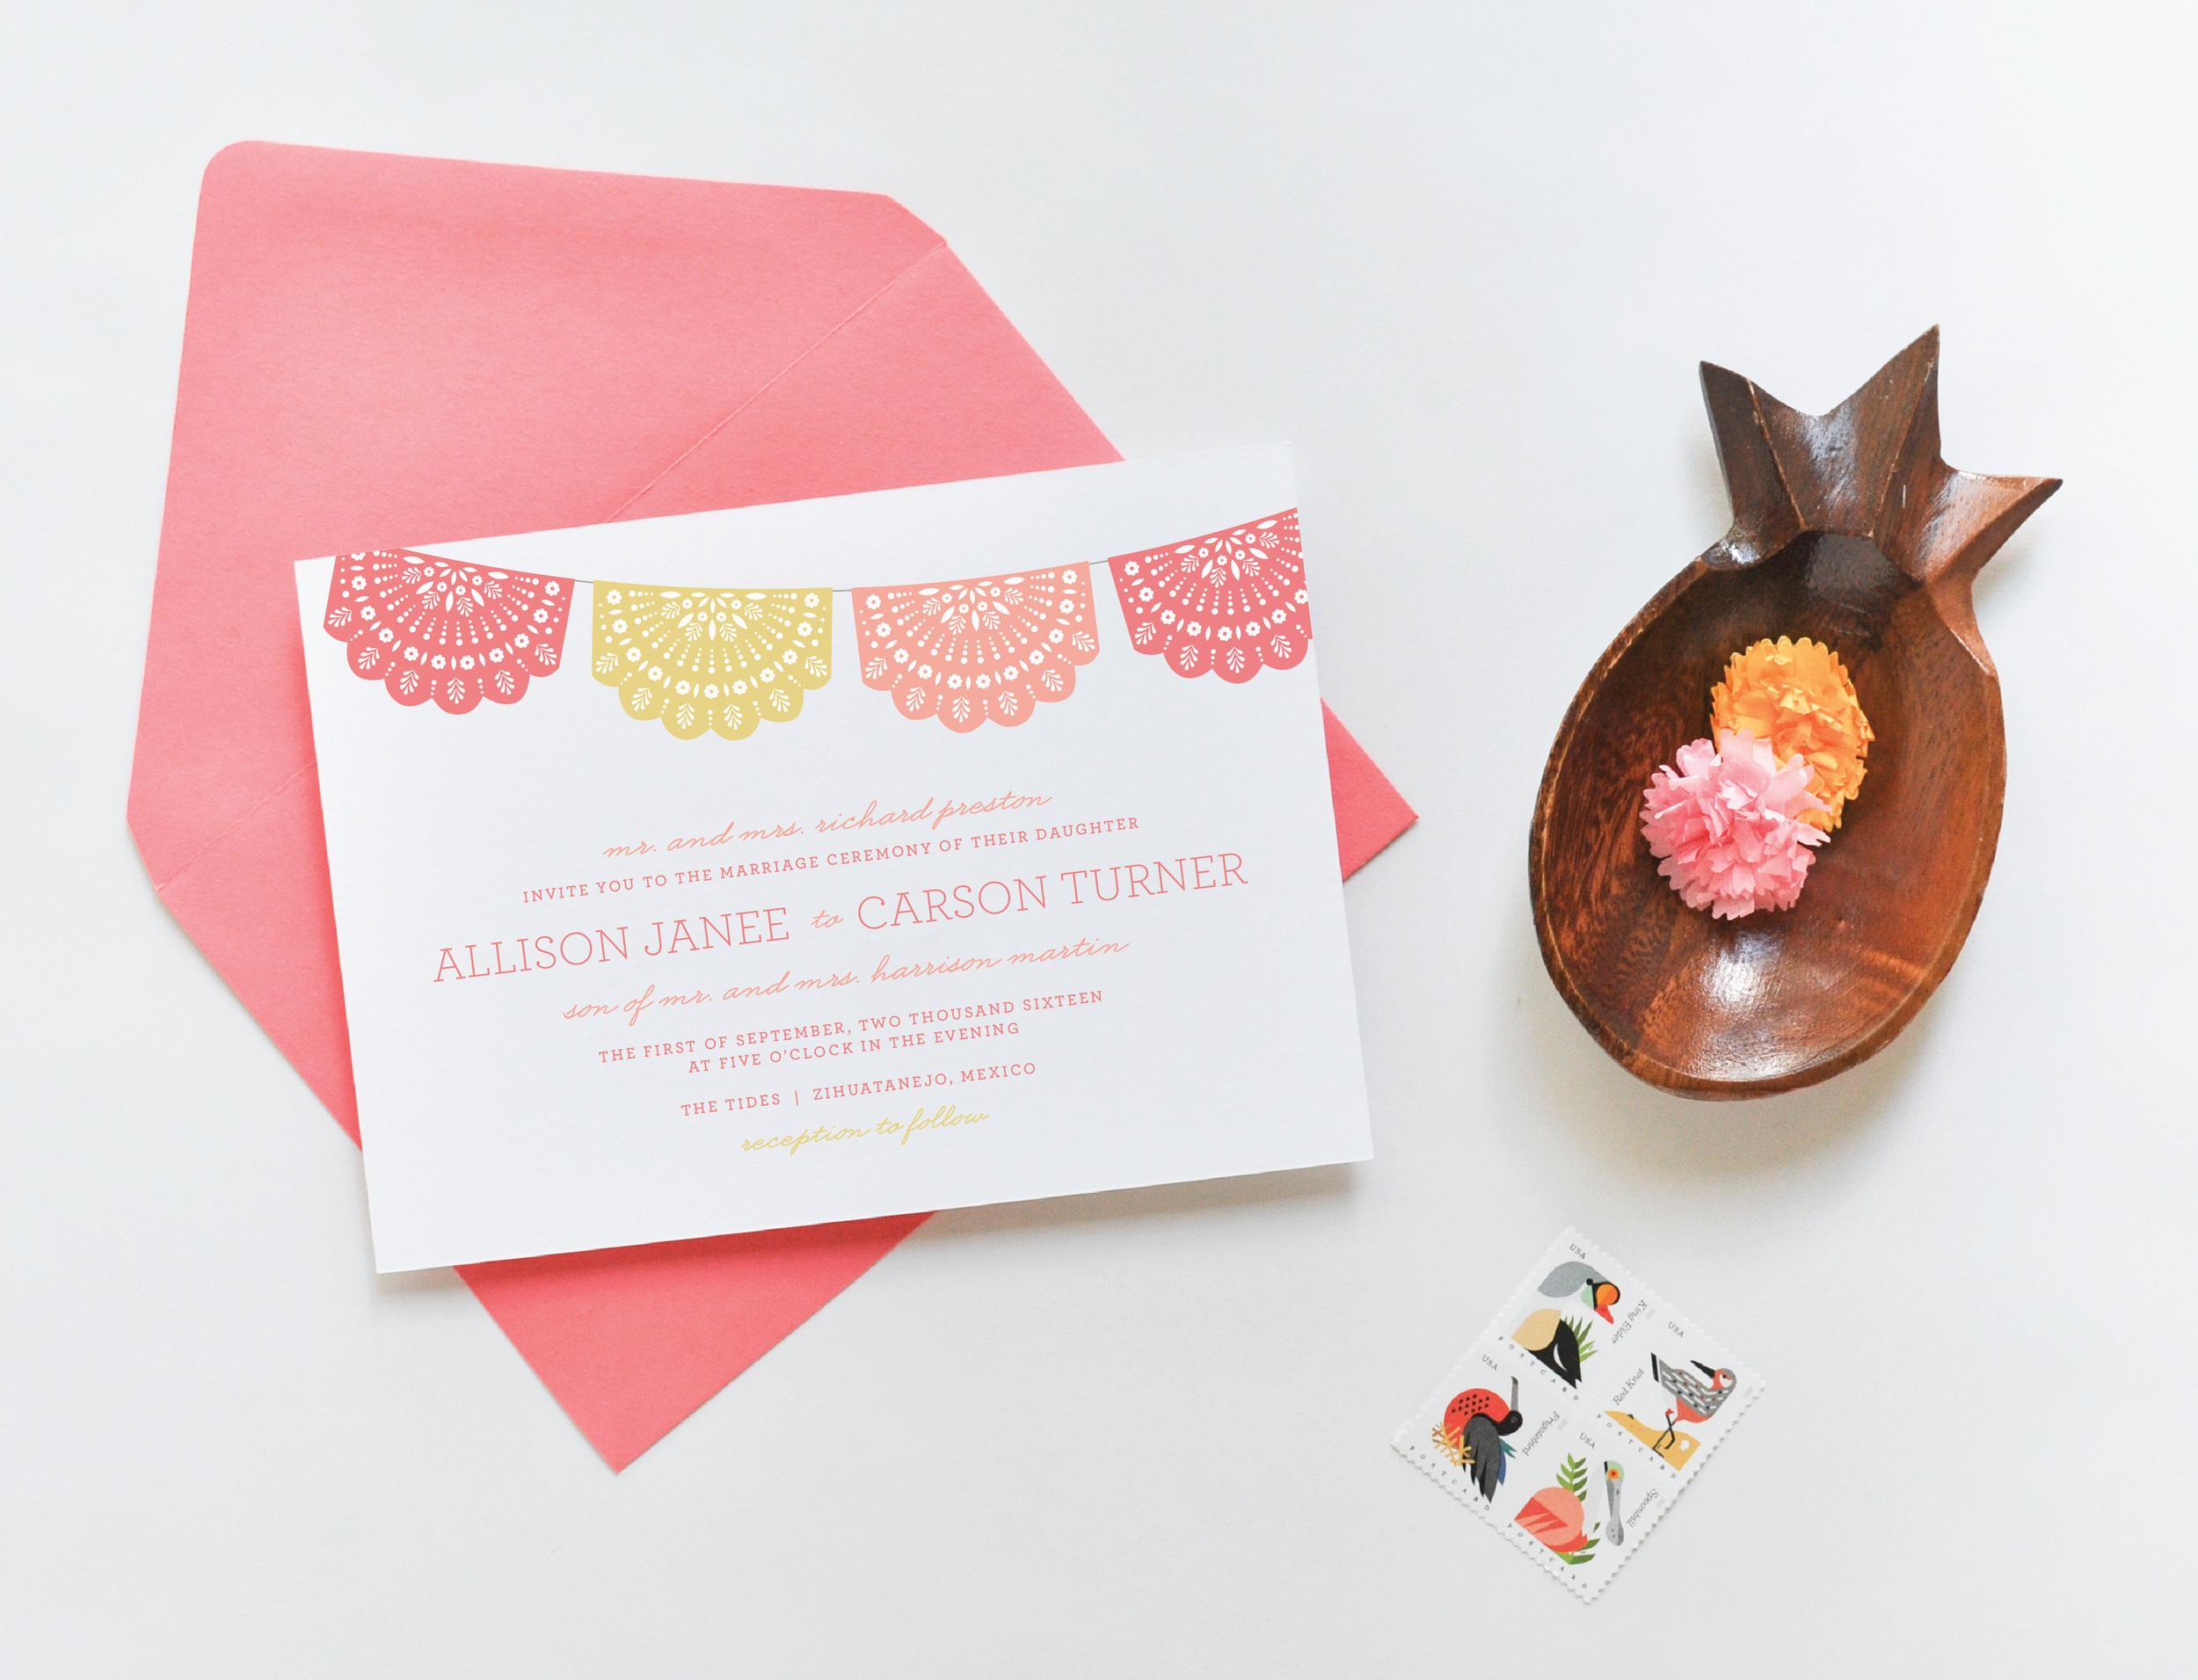 Bodega Fiesta Papel Picado Wedding Invitation_2-01.jpg